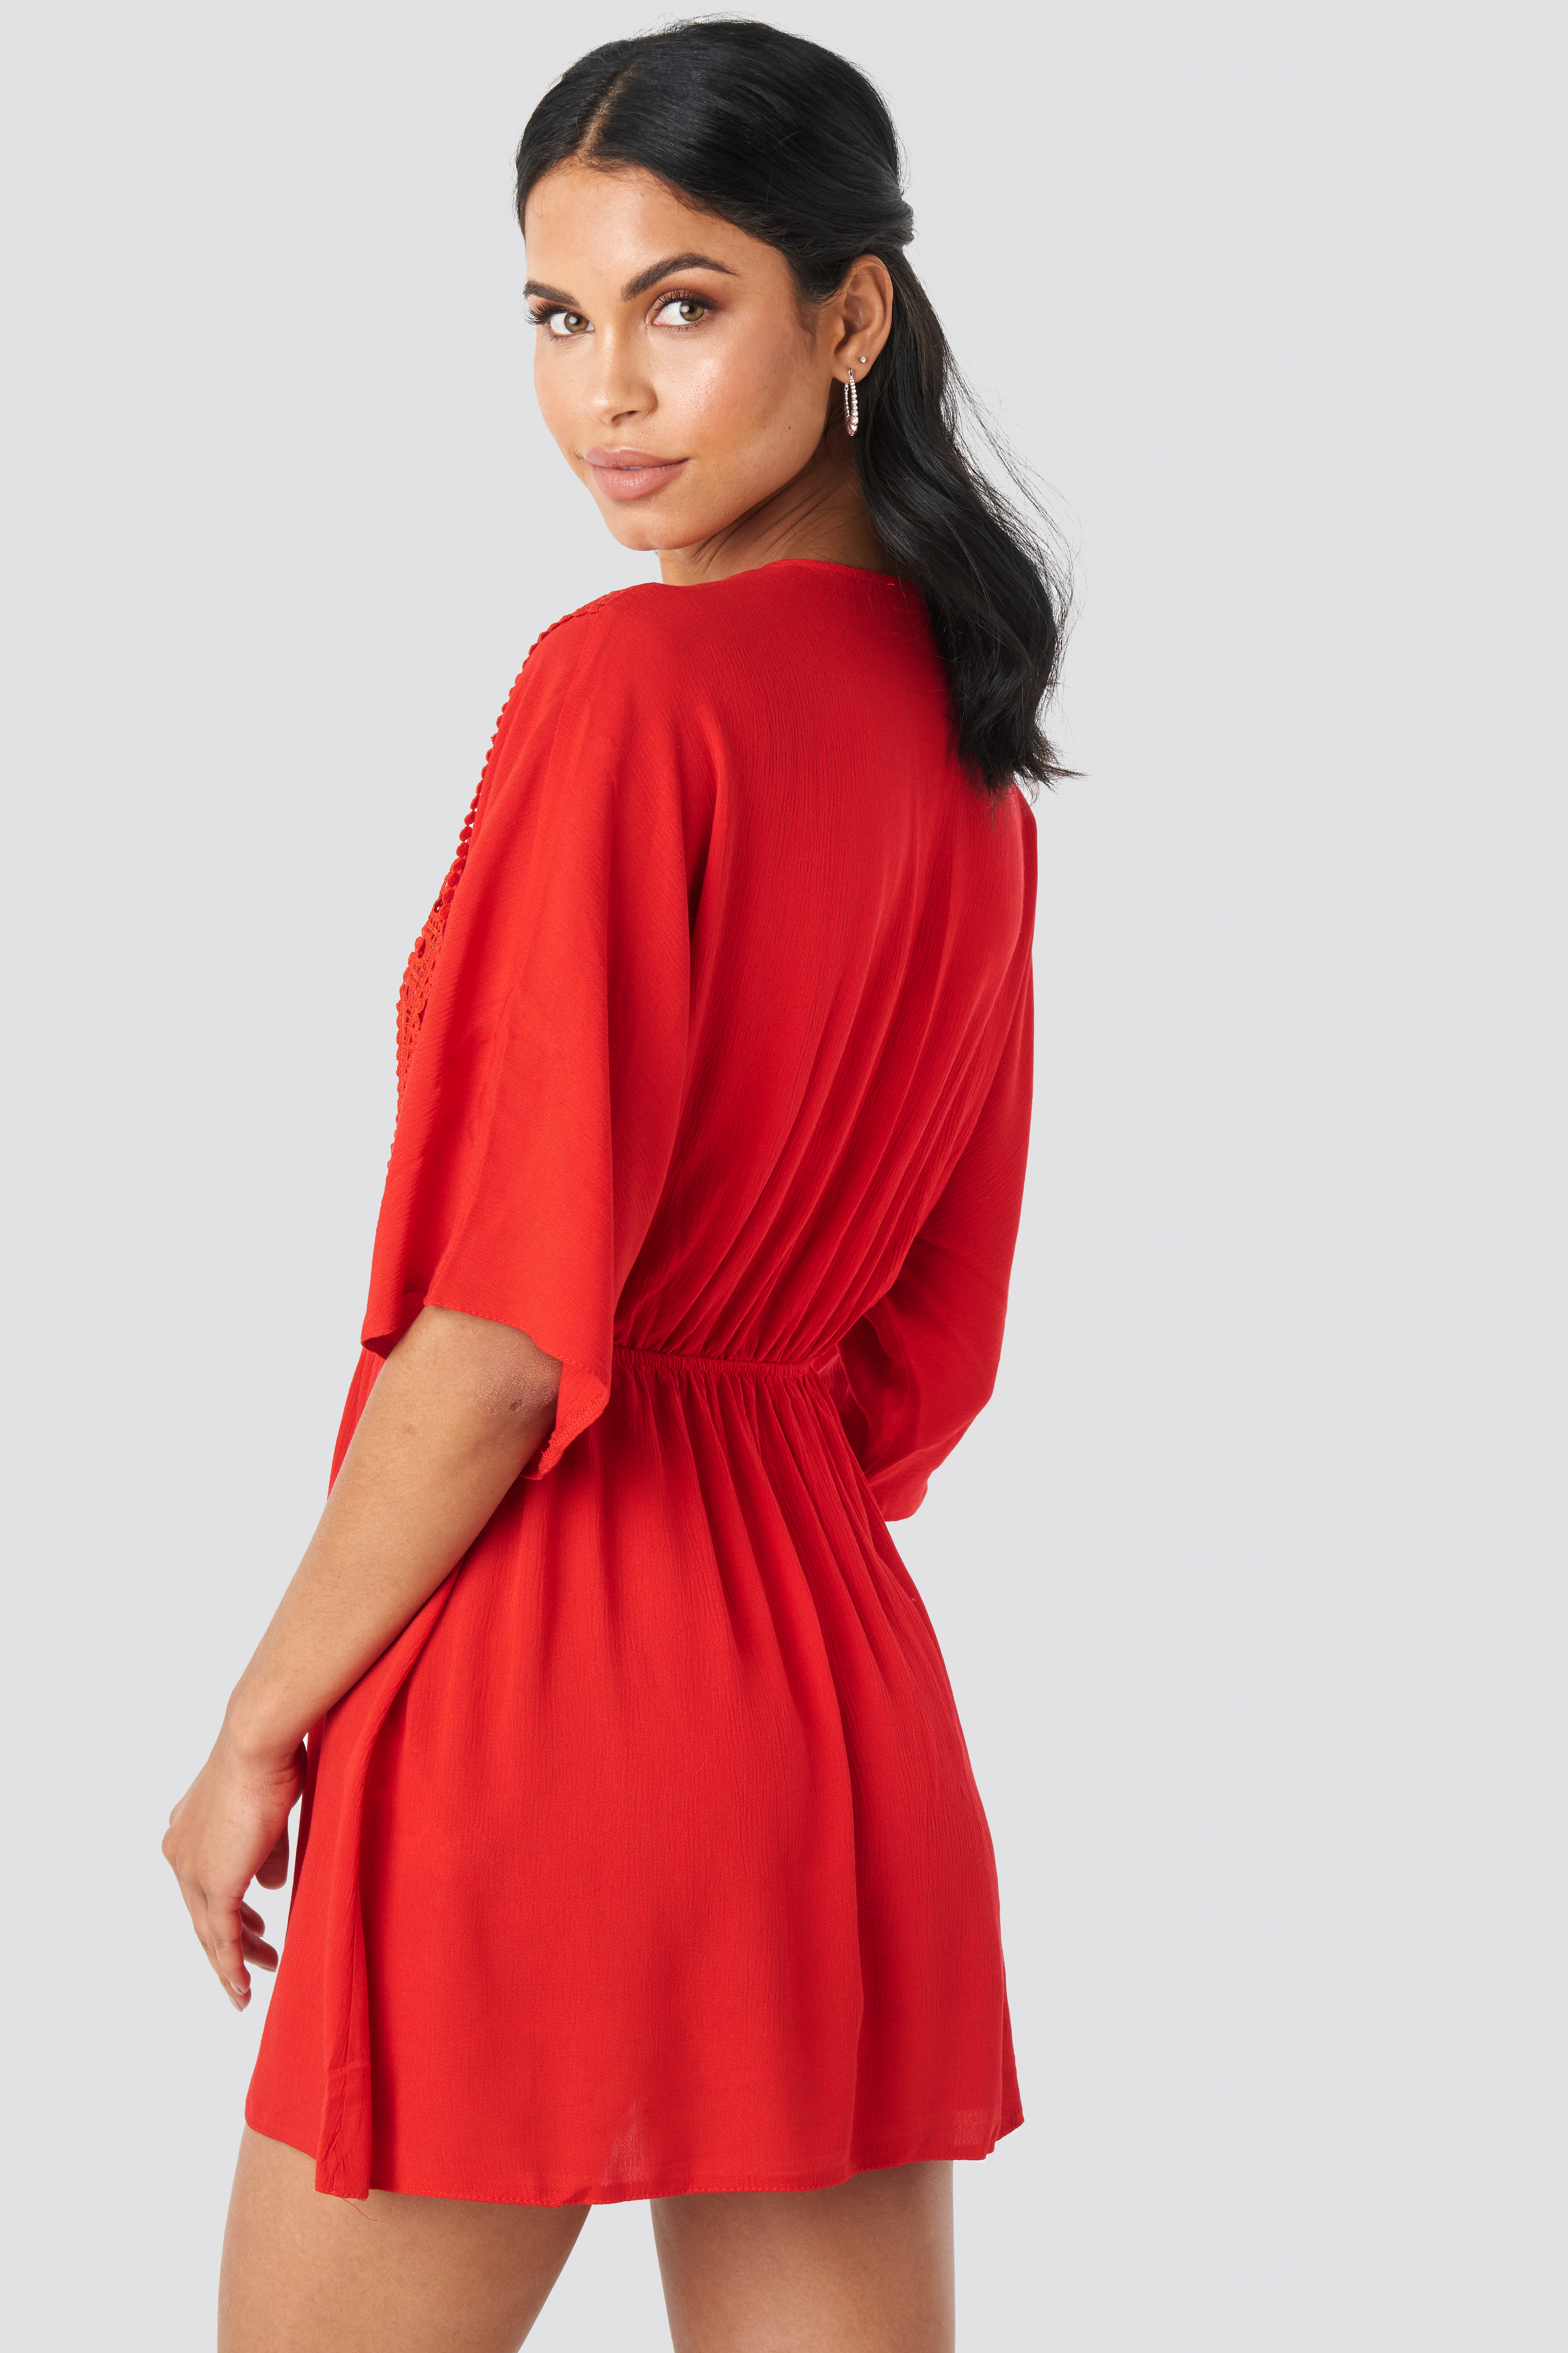 Ribbon Accessory Detailed Dress NA-KD.COM